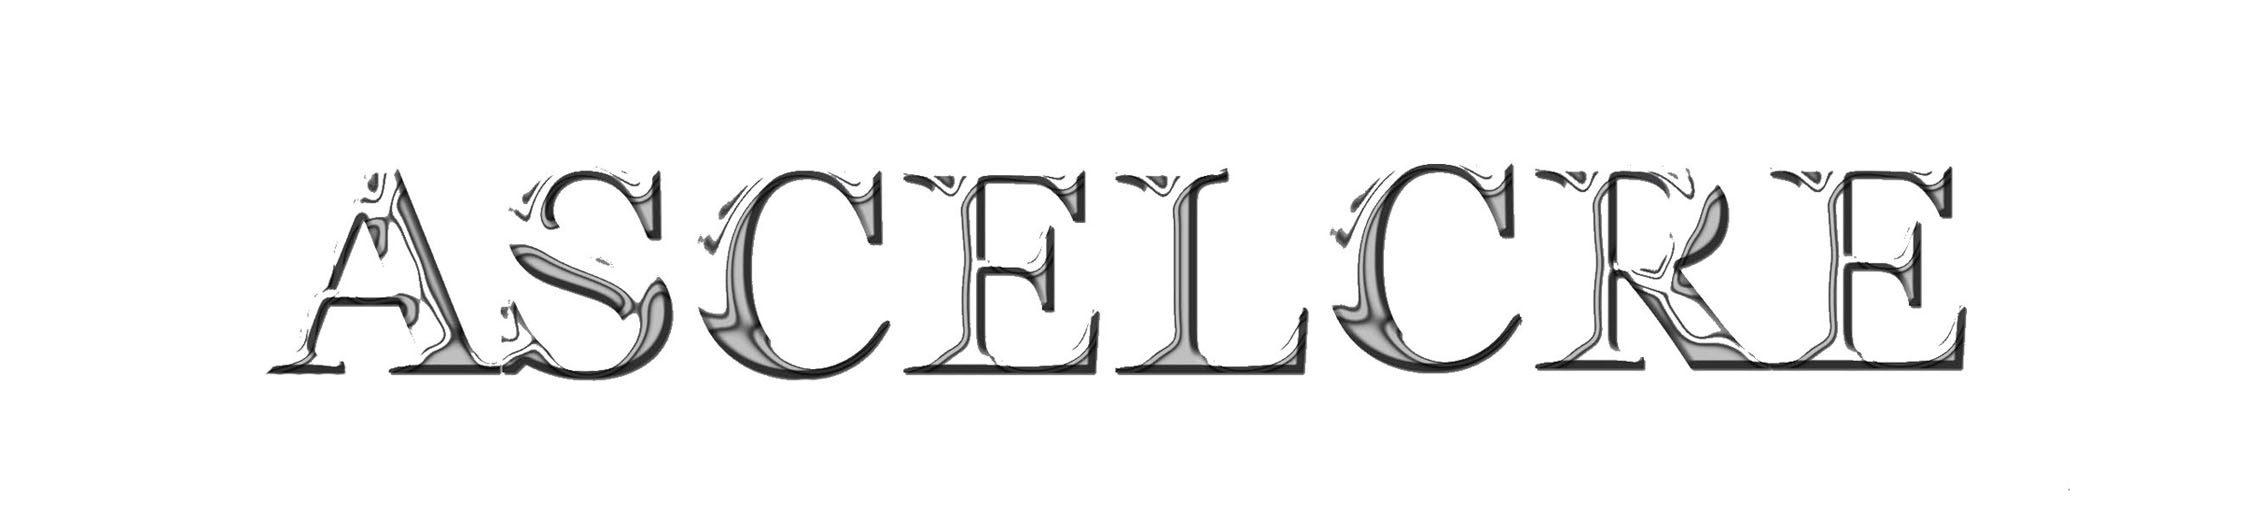 Peludos pertenece a Ascelcre